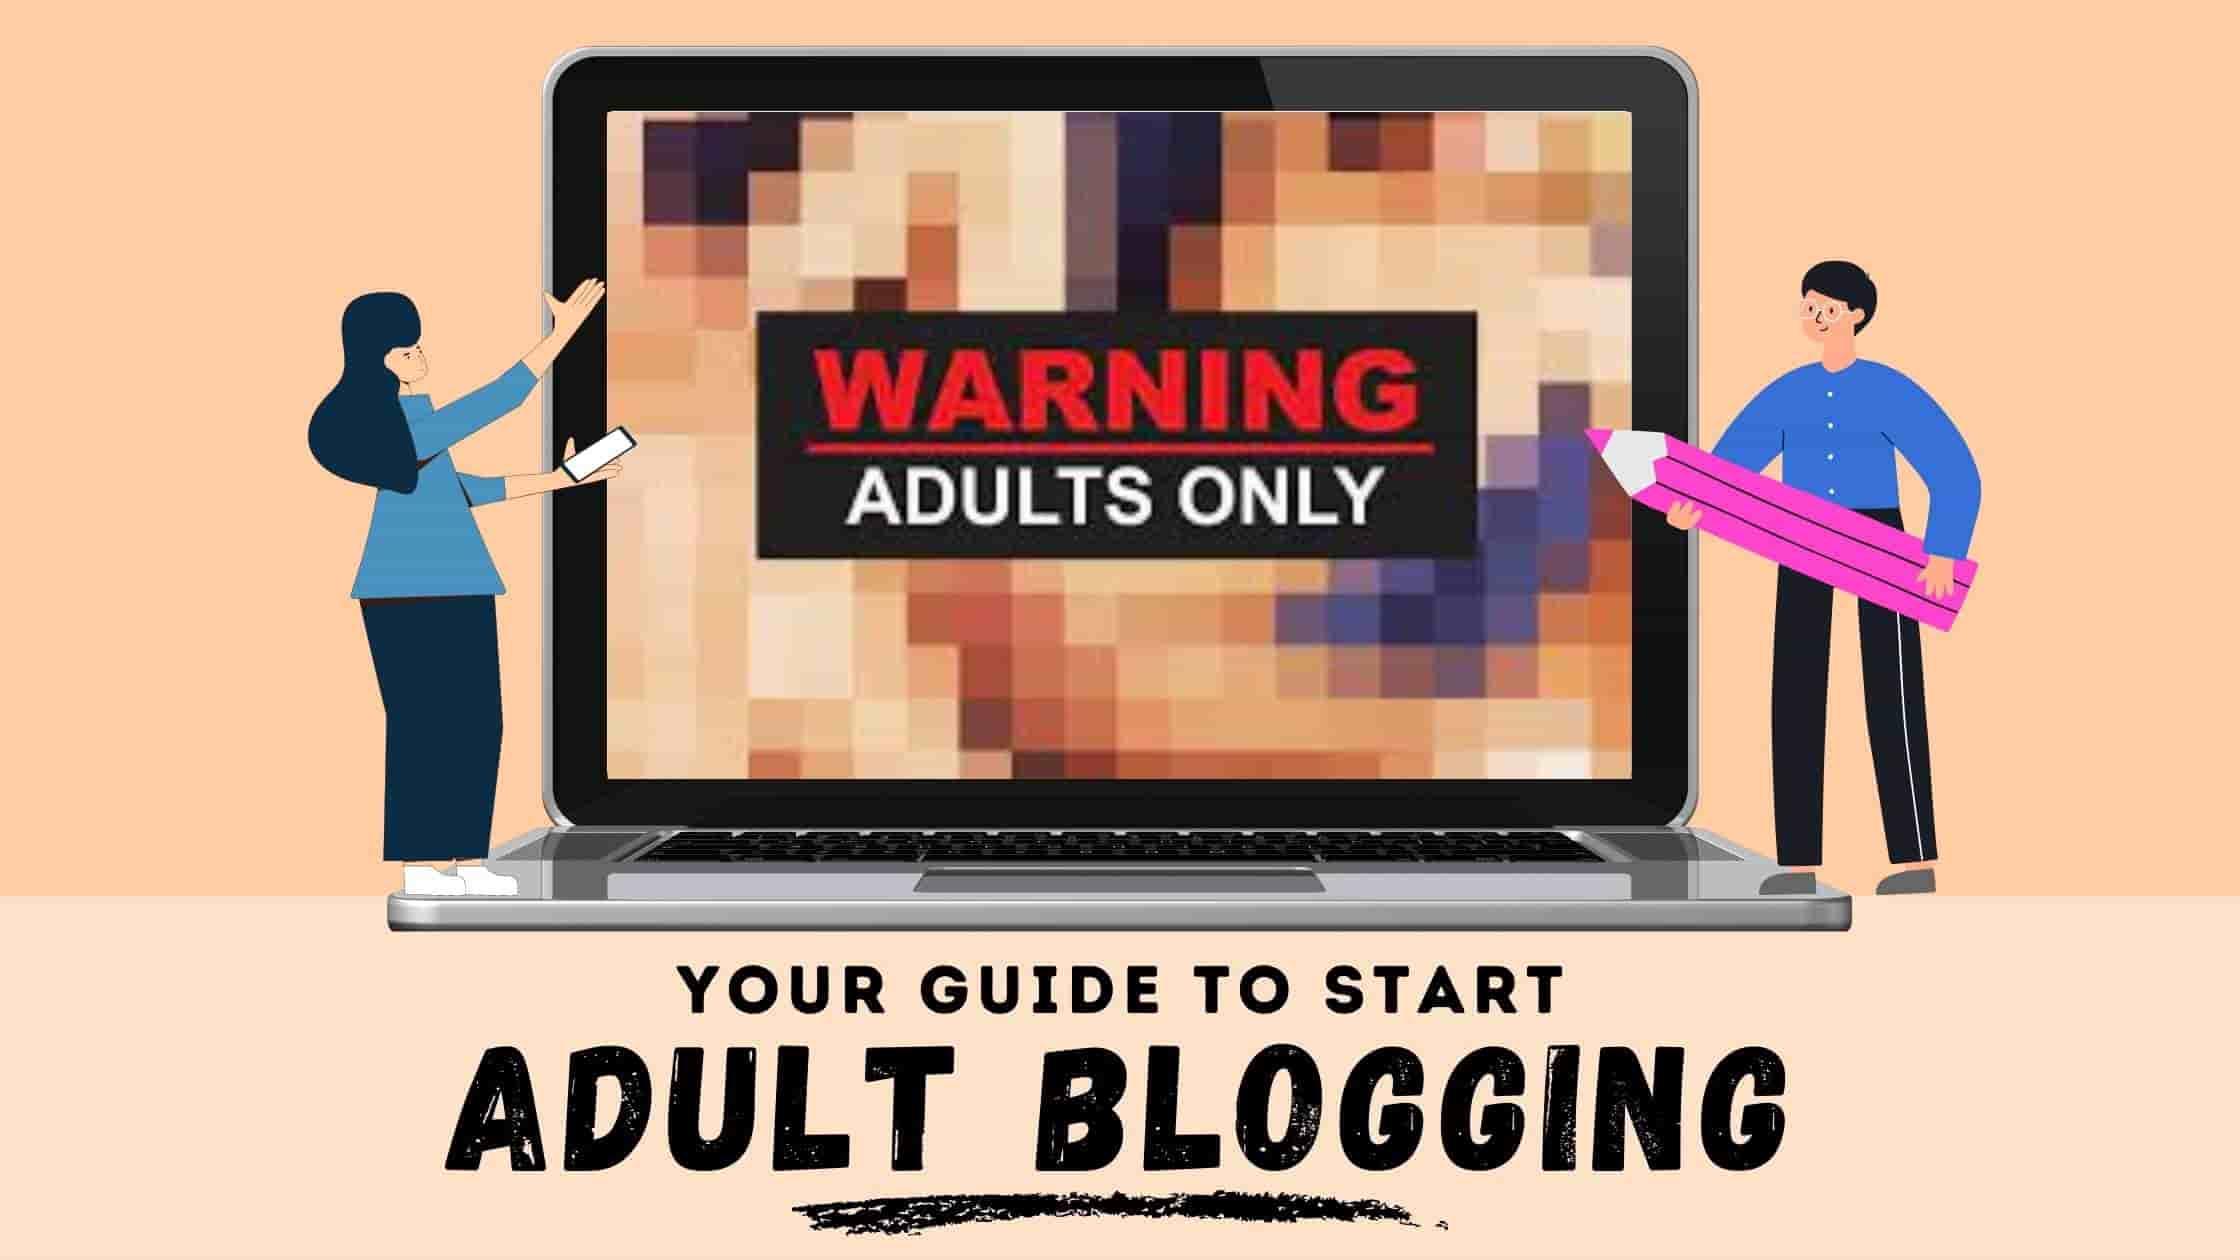 Starting an adult blog